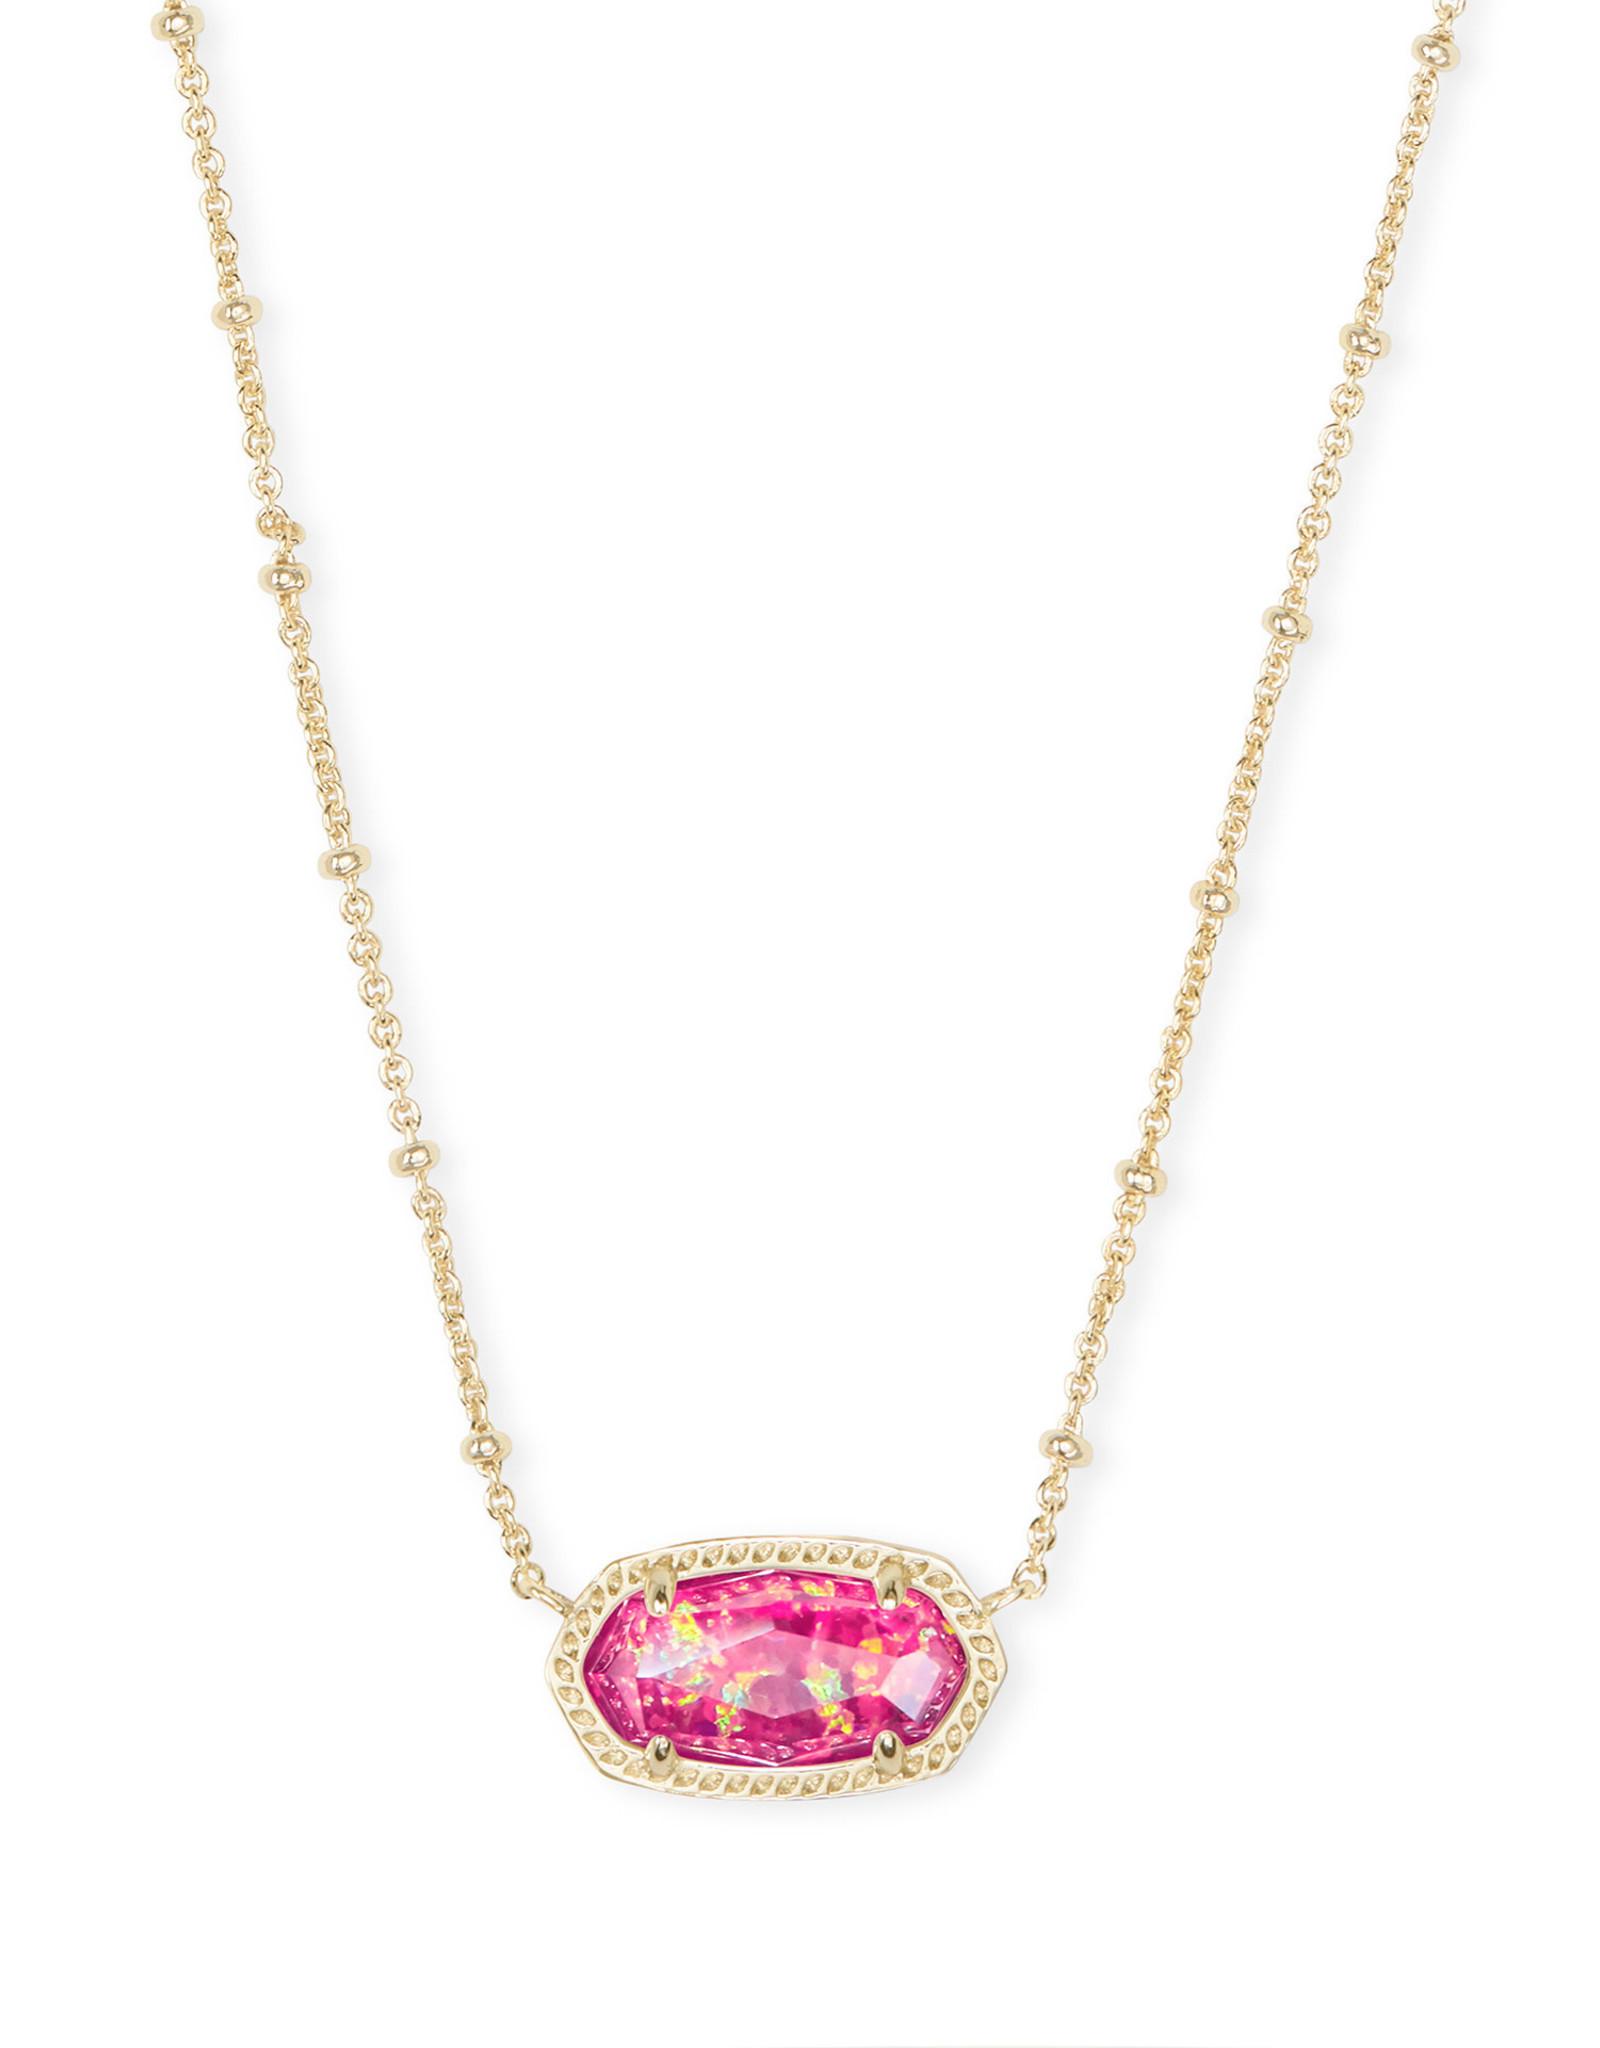 Kendra Scott Elisa Satellite Short Necklace - Berry Opal/Gold